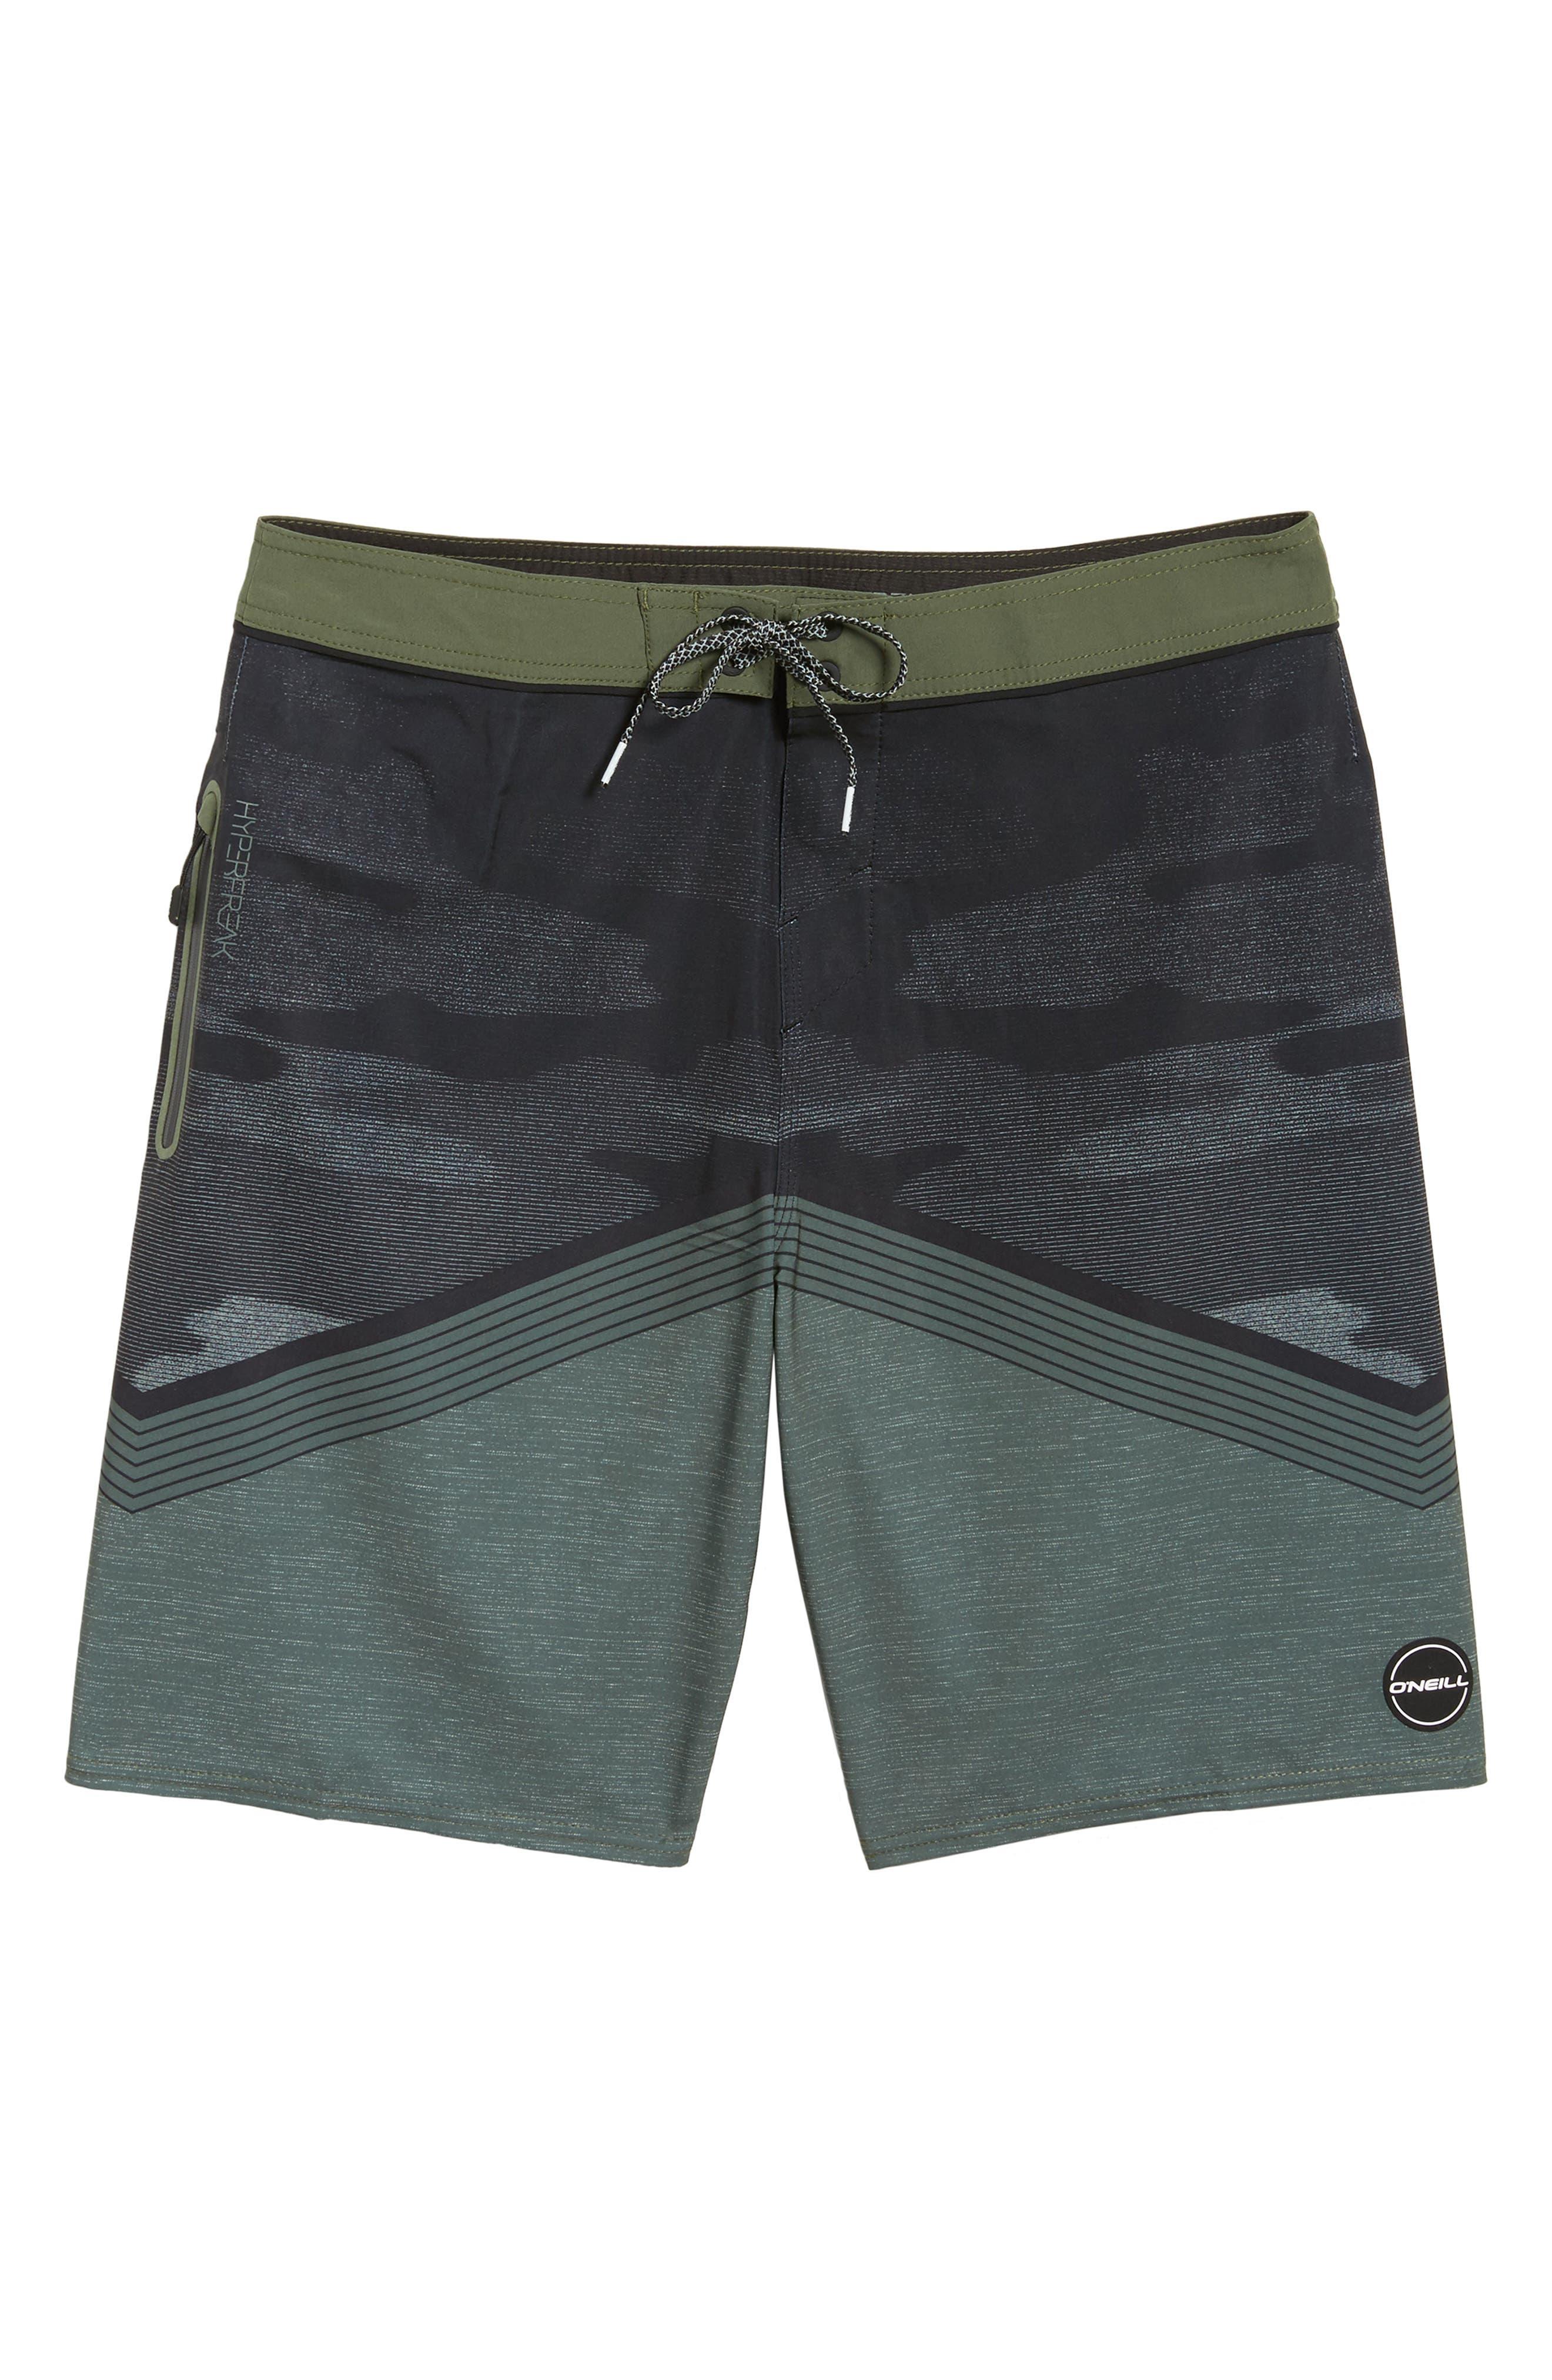 Hyperfreak Stretch Board Shorts,                             Alternate thumbnail 6, color,                             310